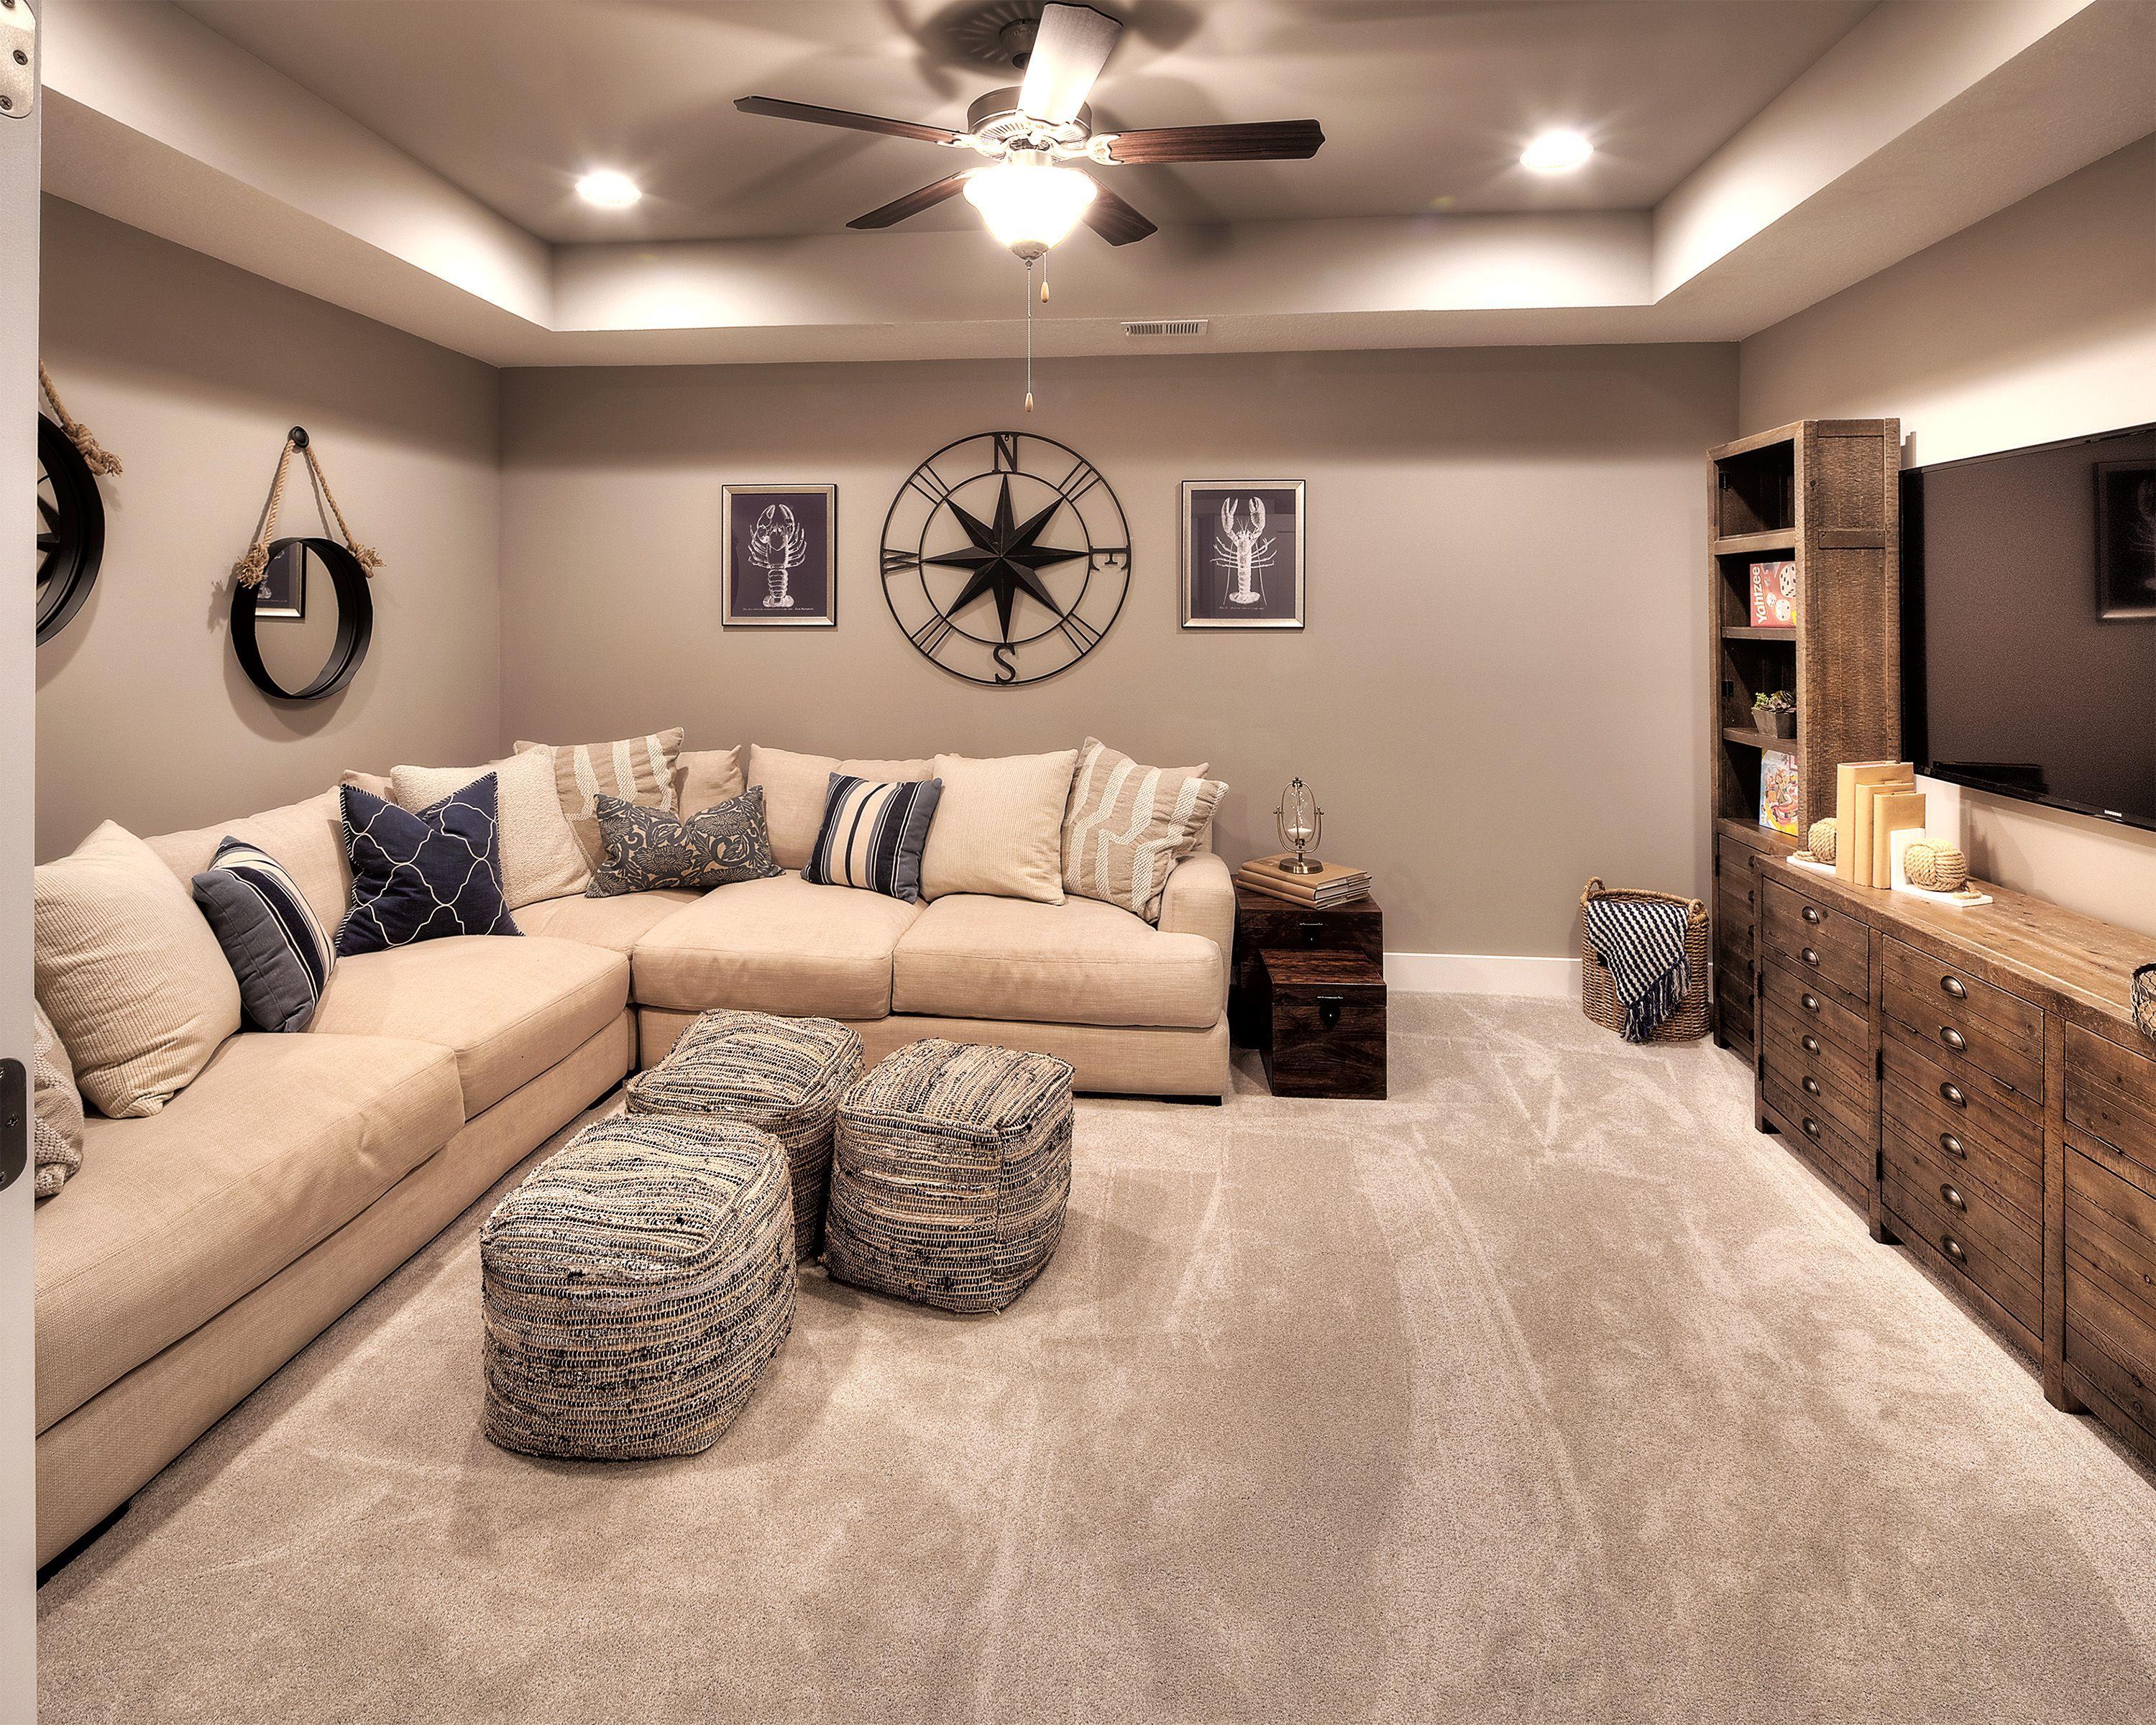 17 Most Popular Bonus Room Ideas, Designs & Styles images